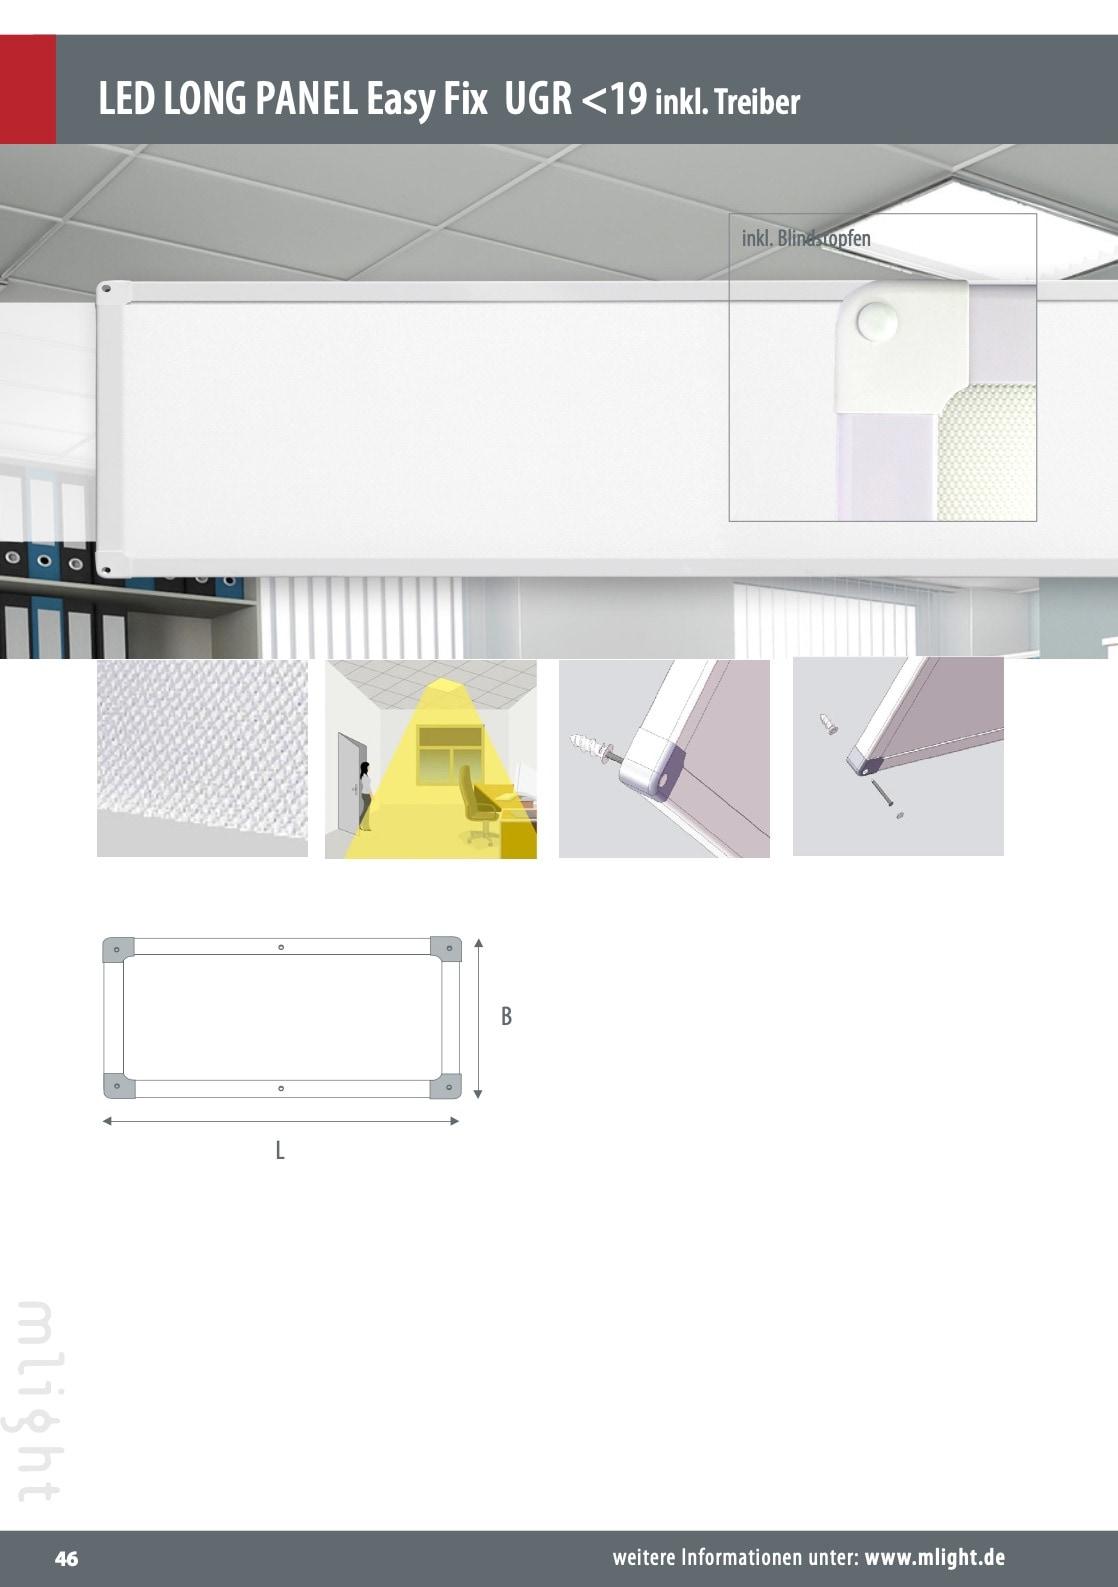 M-Light LED Deckananbau Panel UGR>19 1500x300x34mm 40W 4000K 4900lm weiß 81-2099